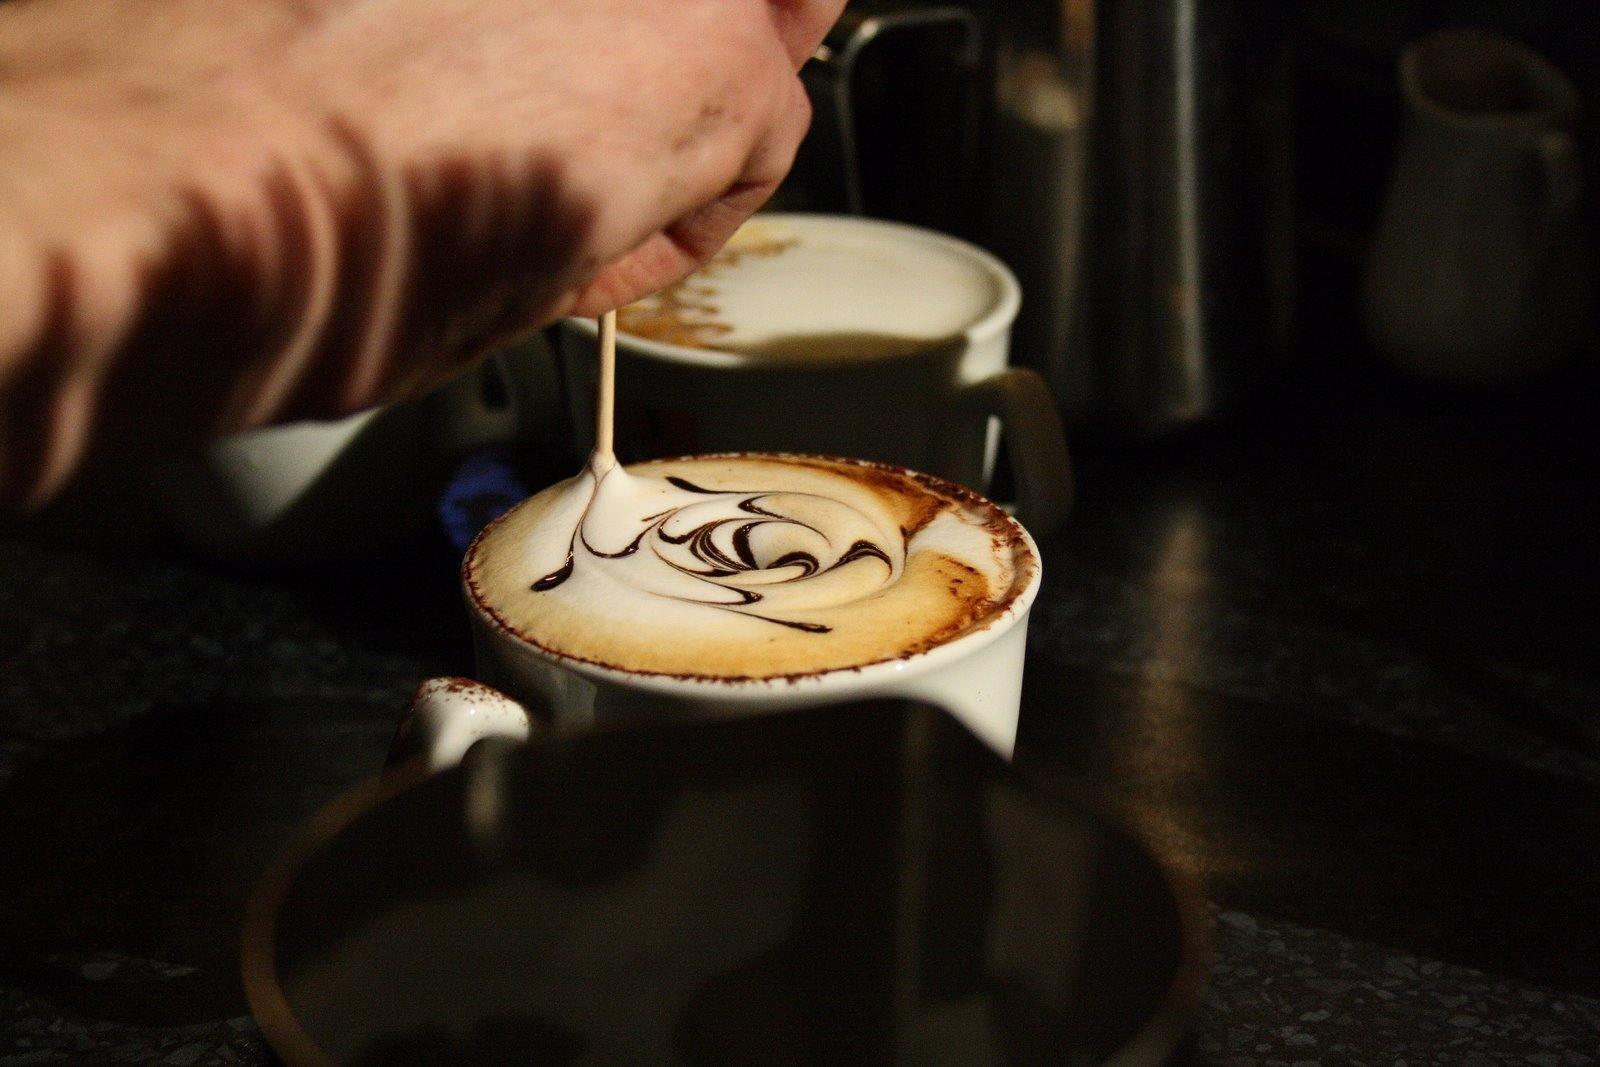 The making of latte art.